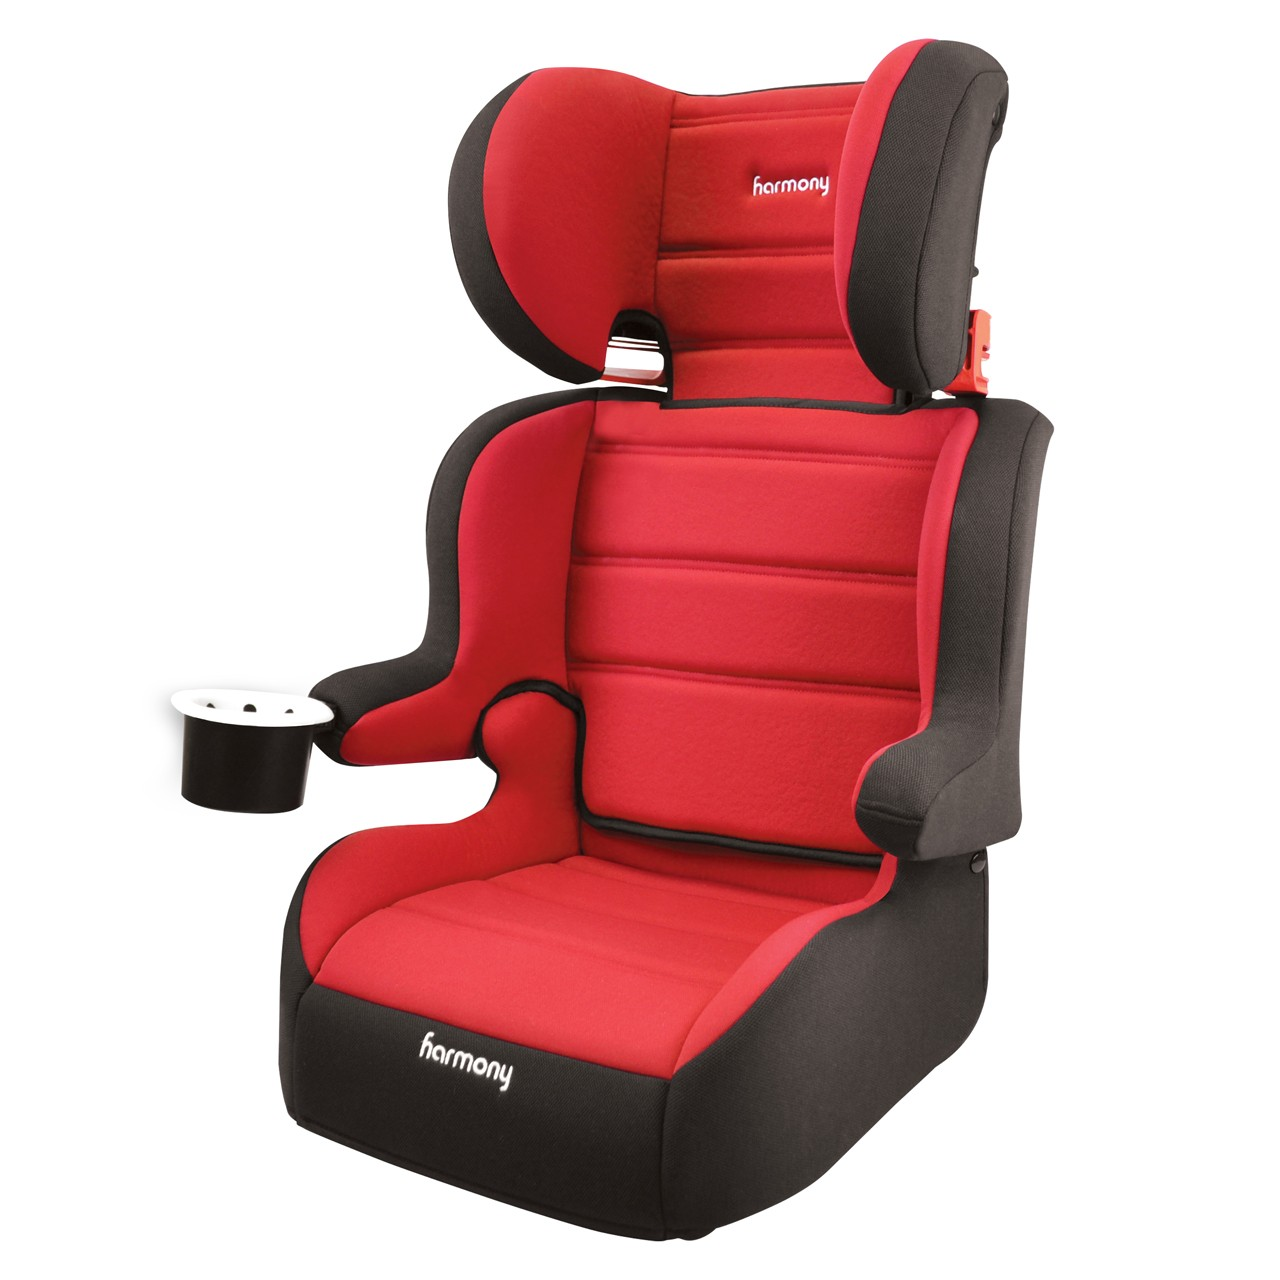 booster seat chair bedroom reading uk folding travel world traveler edition